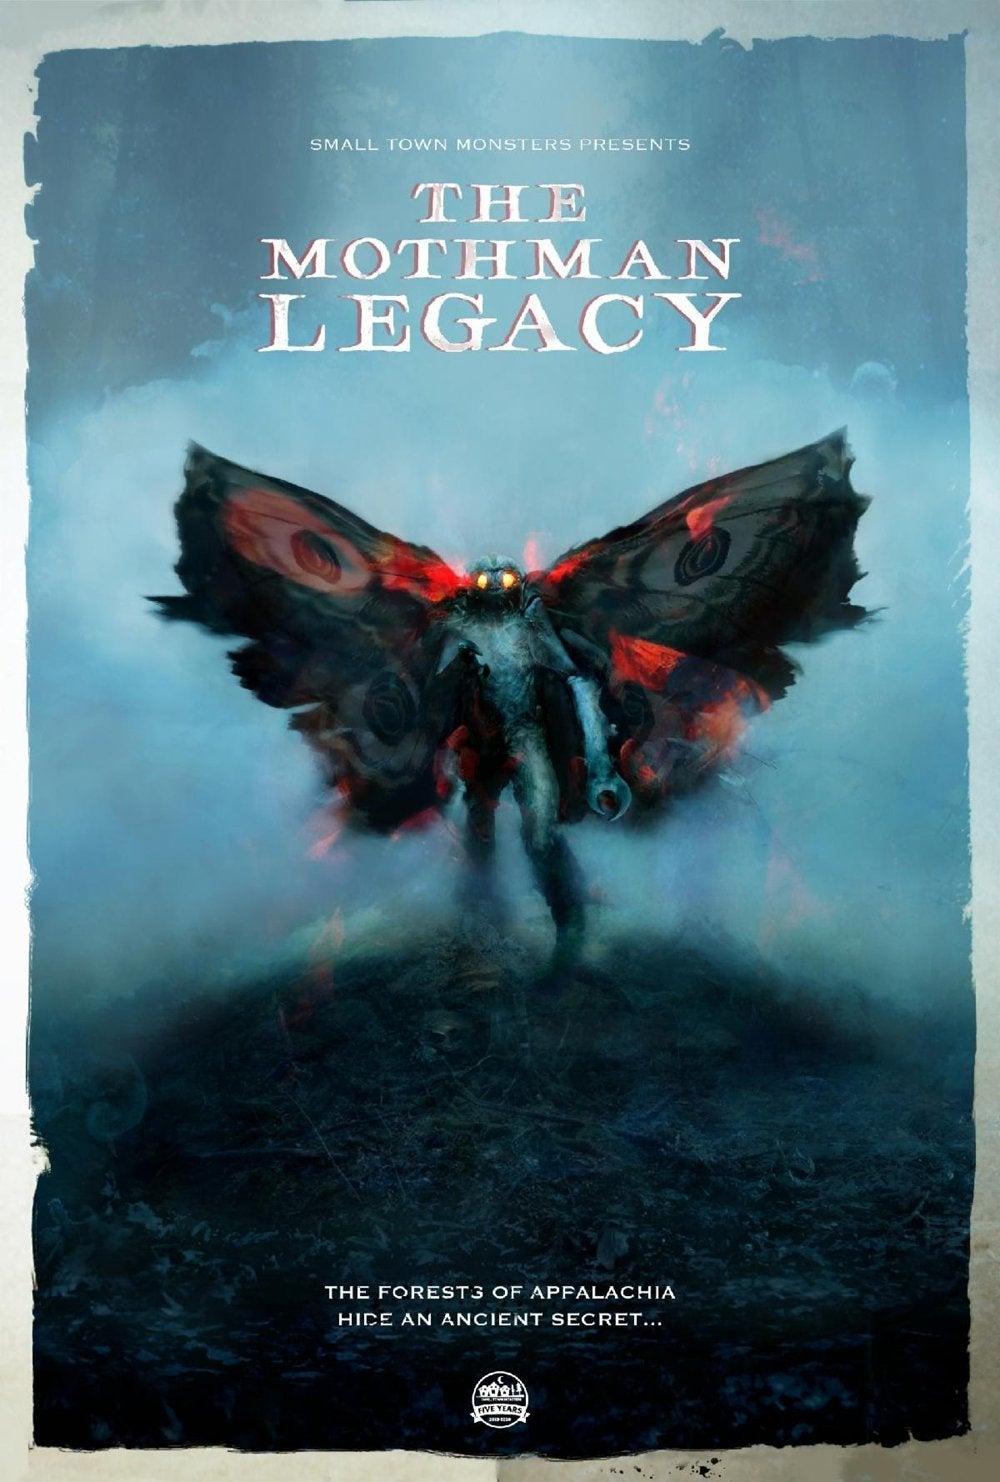 [Pilt: the-mothman-legacy-documentary-poster-1206007.jpeg]